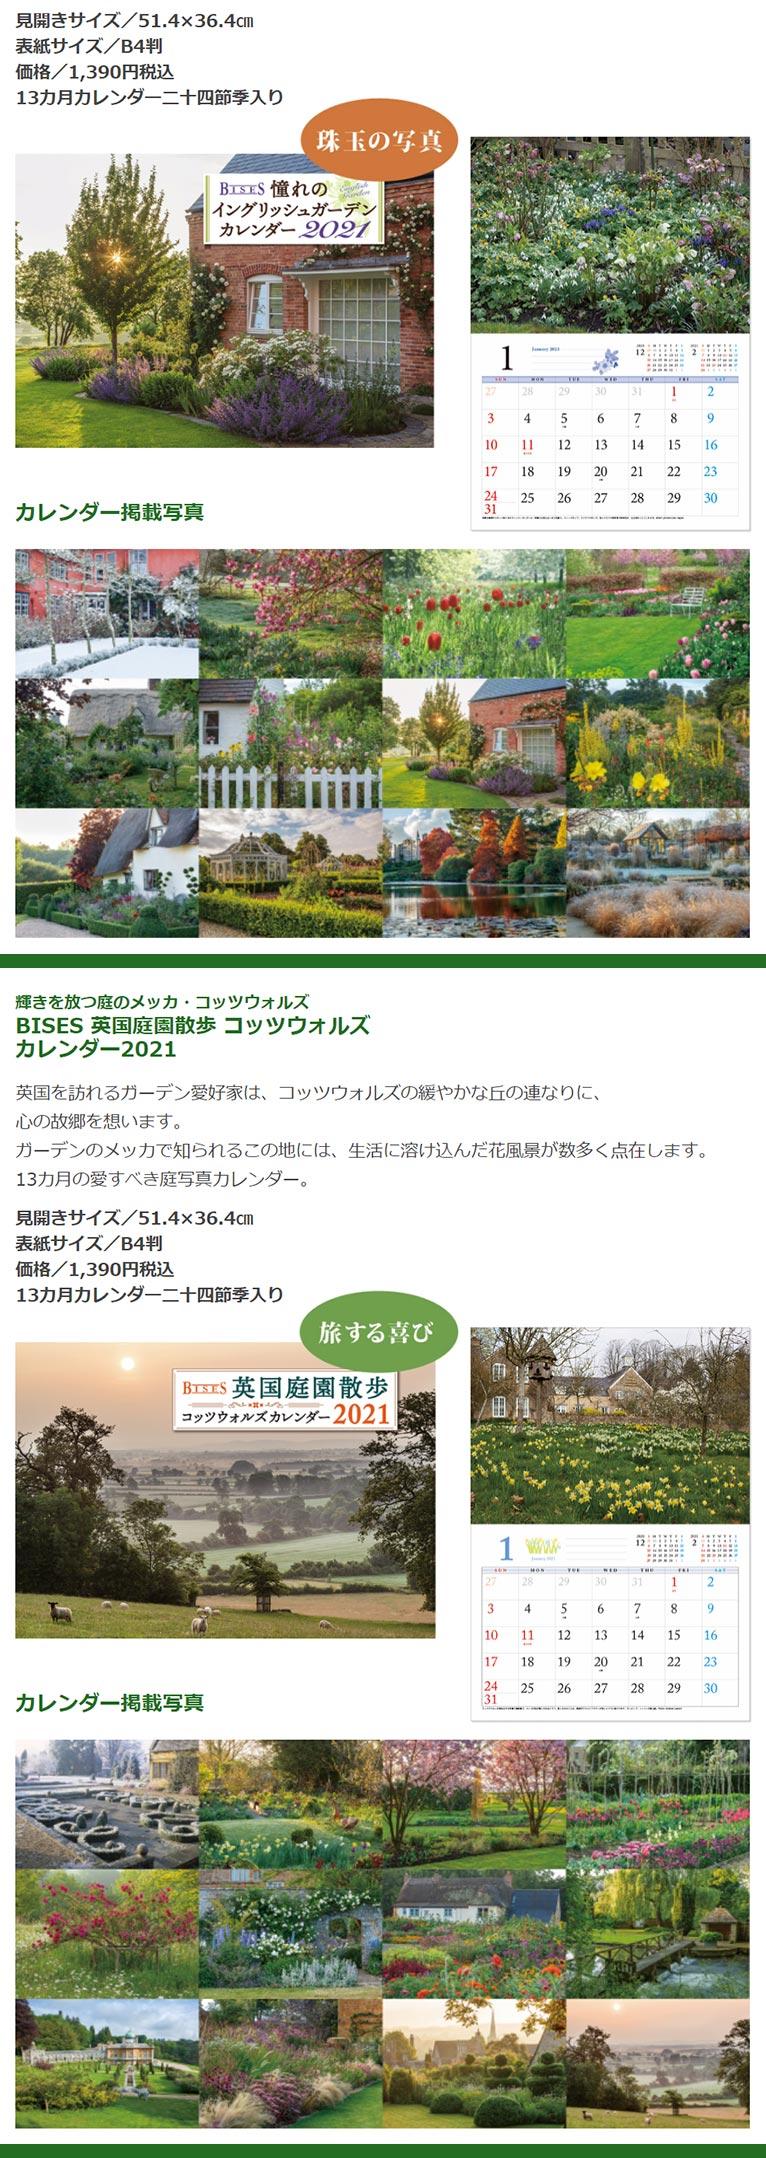 BISESオリジナル2021カレンダー3タイプ発売!